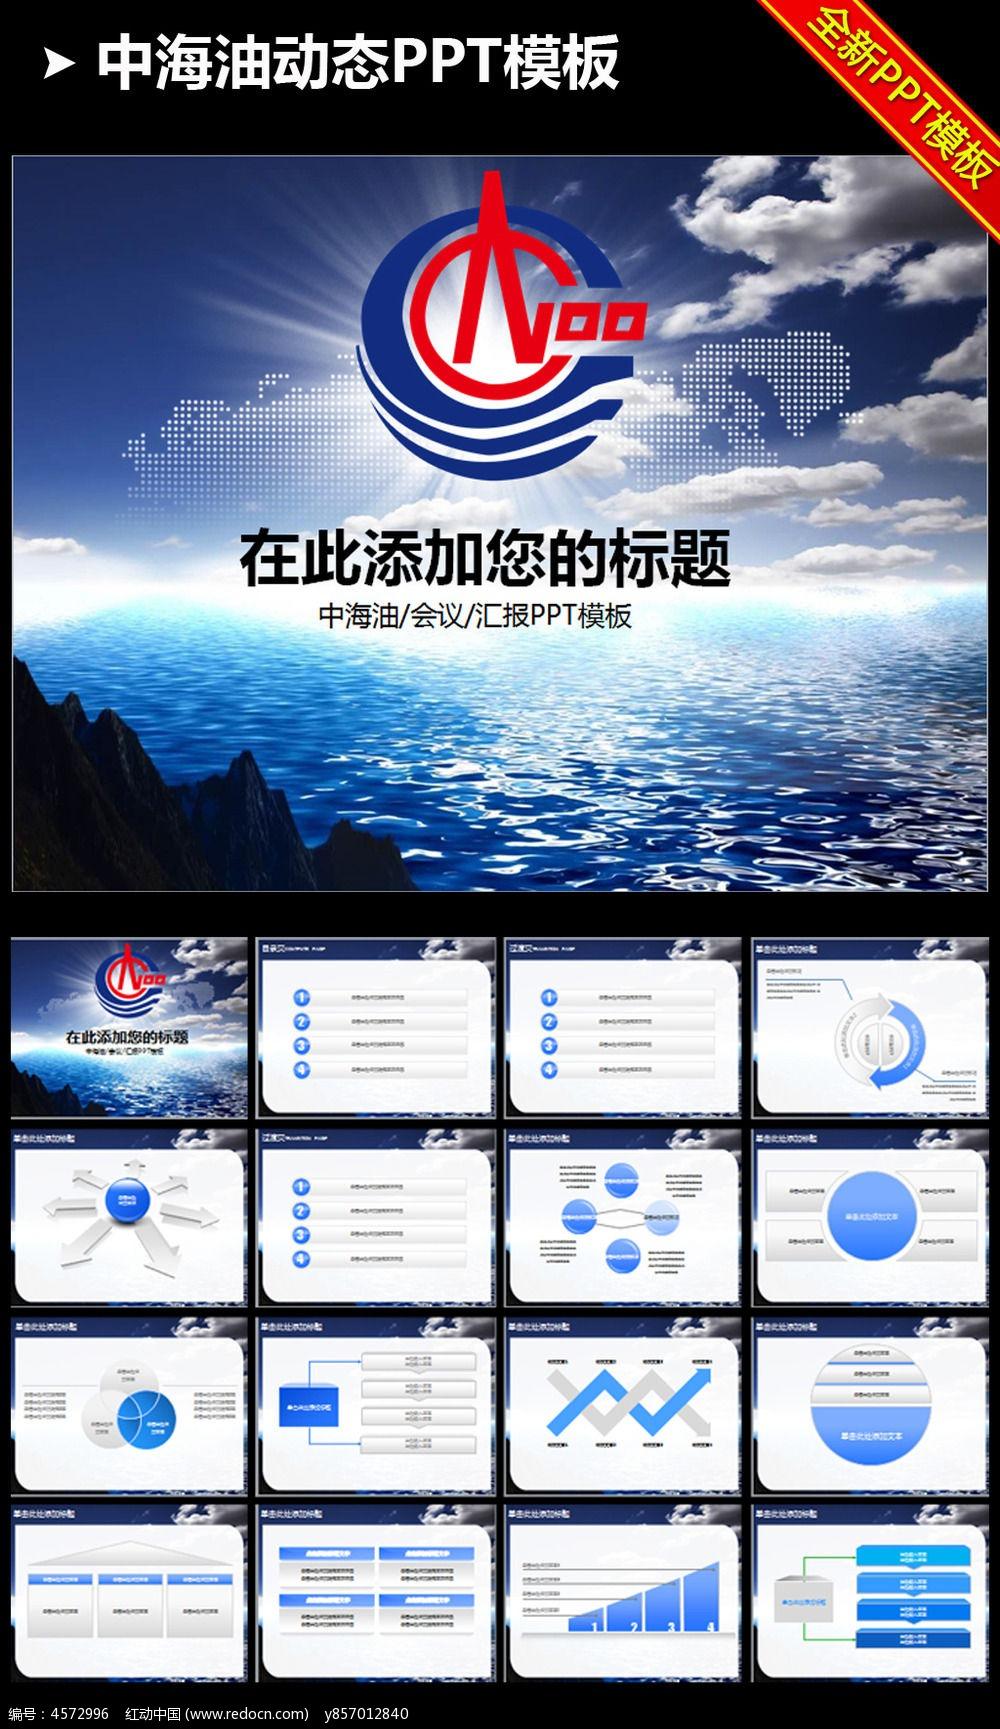 中国海洋石油ppt模板动态